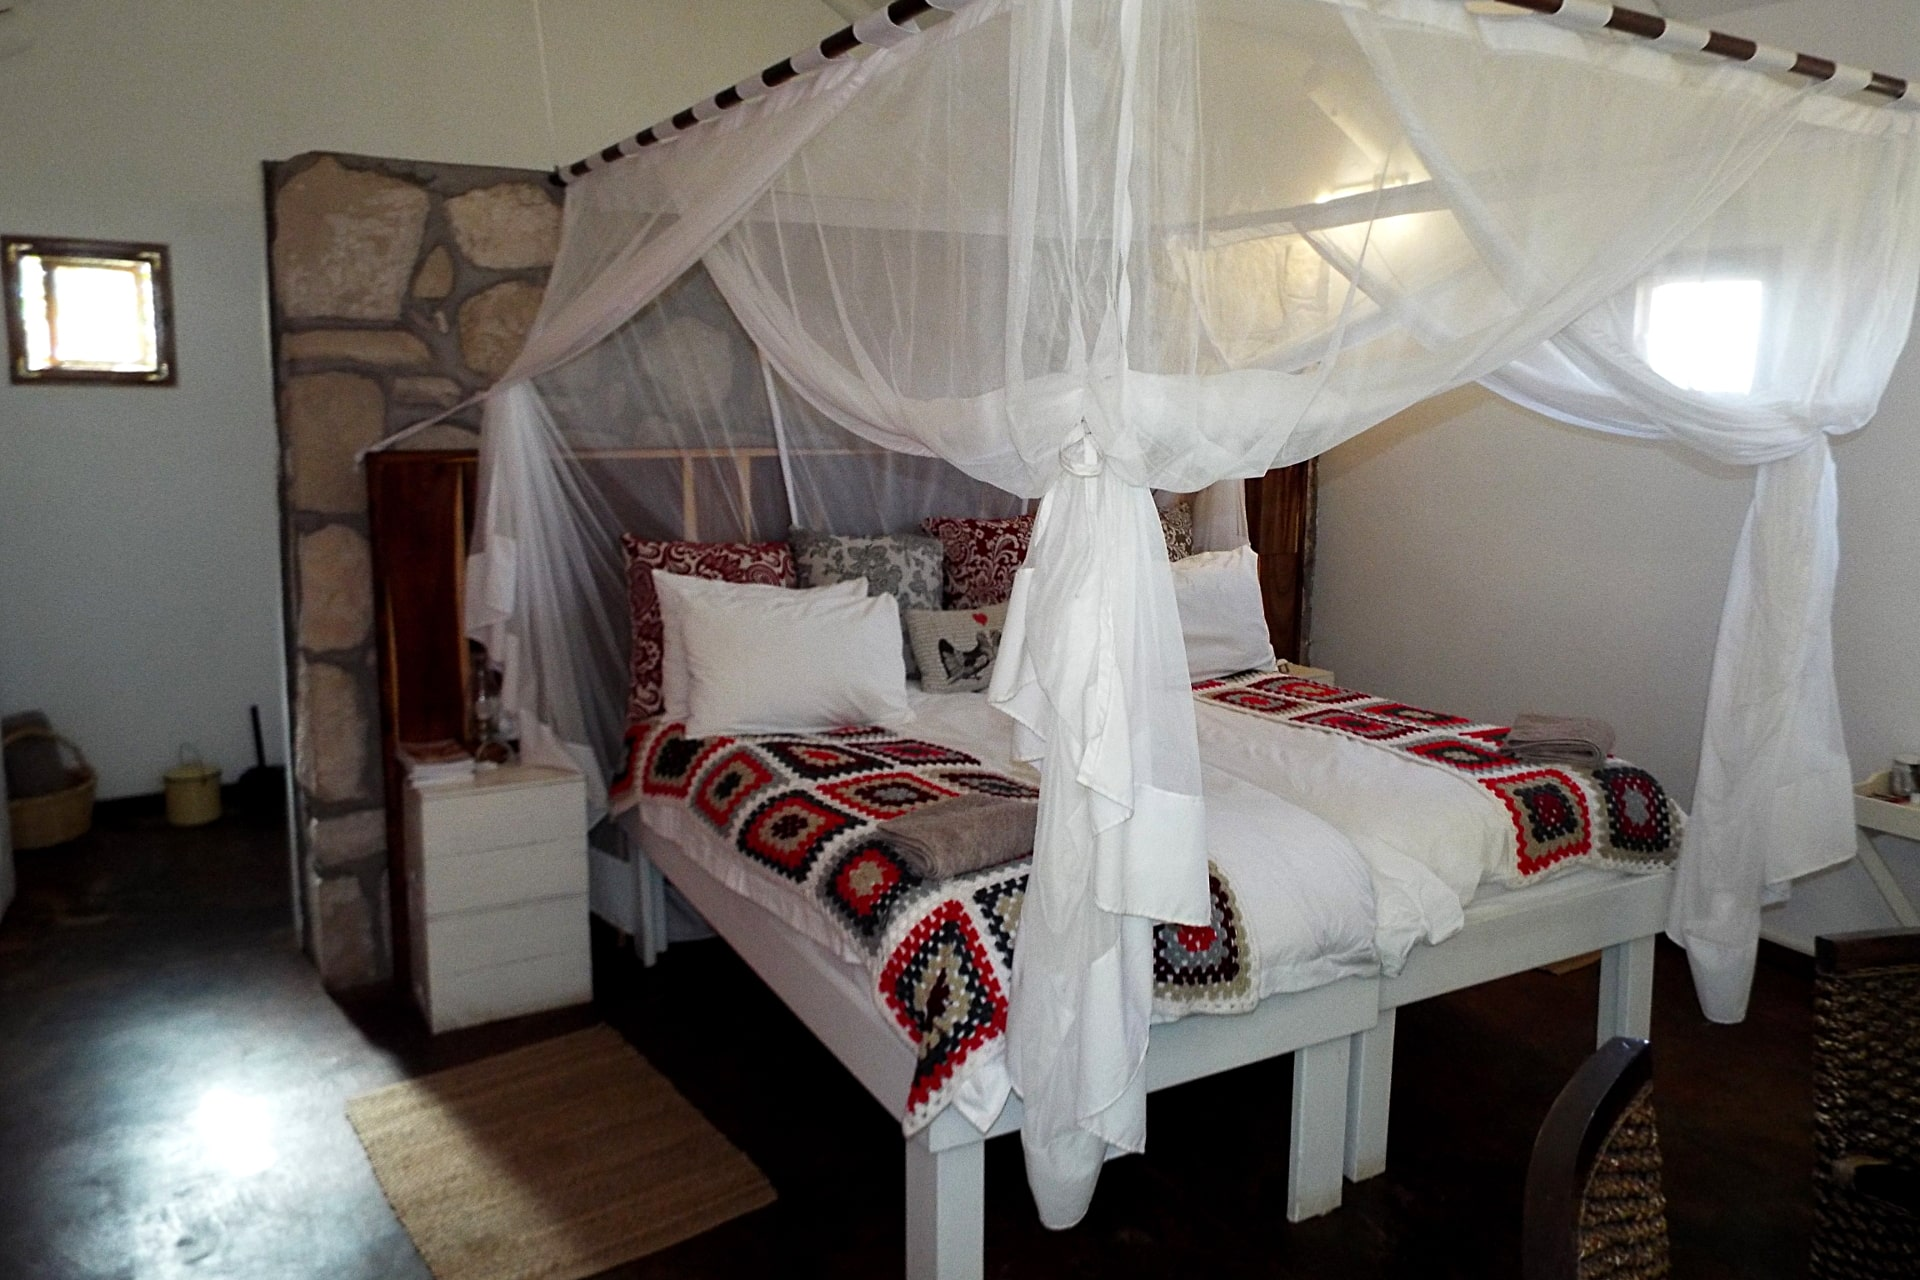 Kalahari Farmhouse - Chalet intérieur